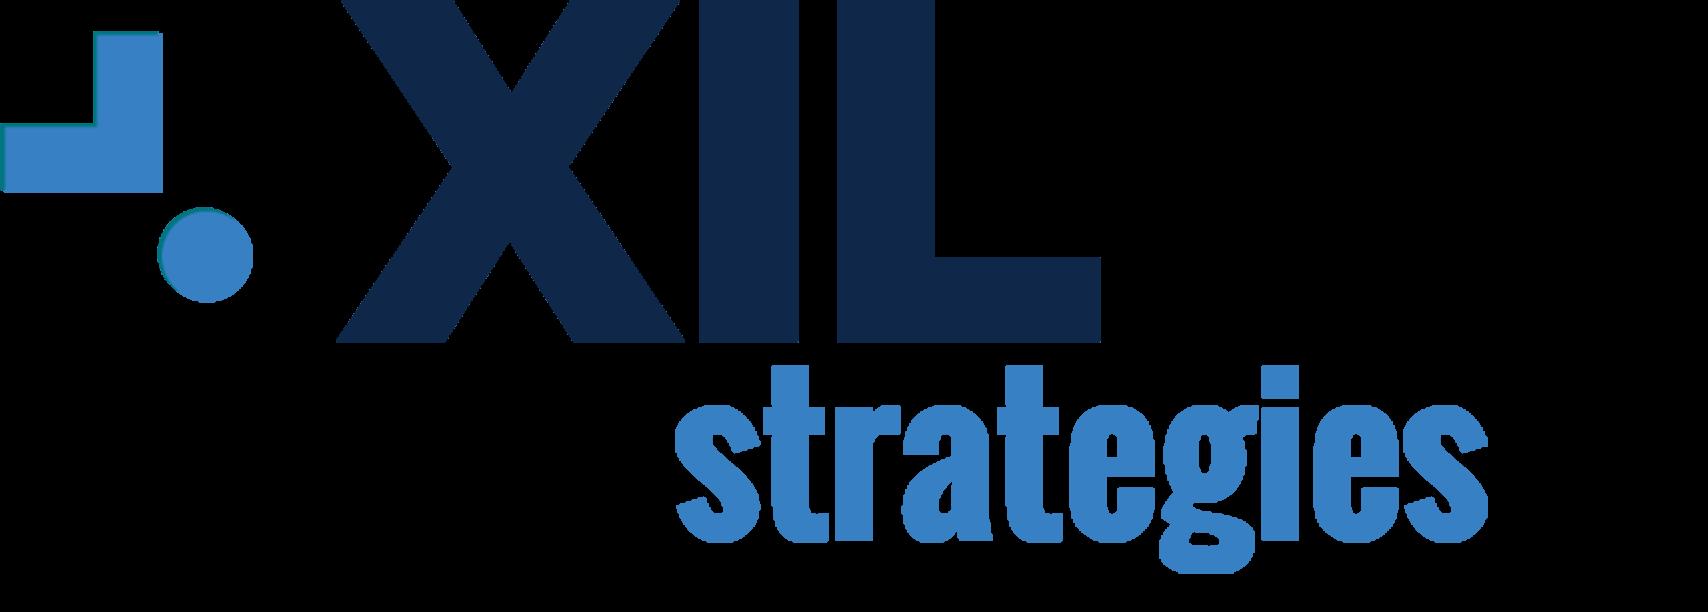 XIL Strategies Home Logo